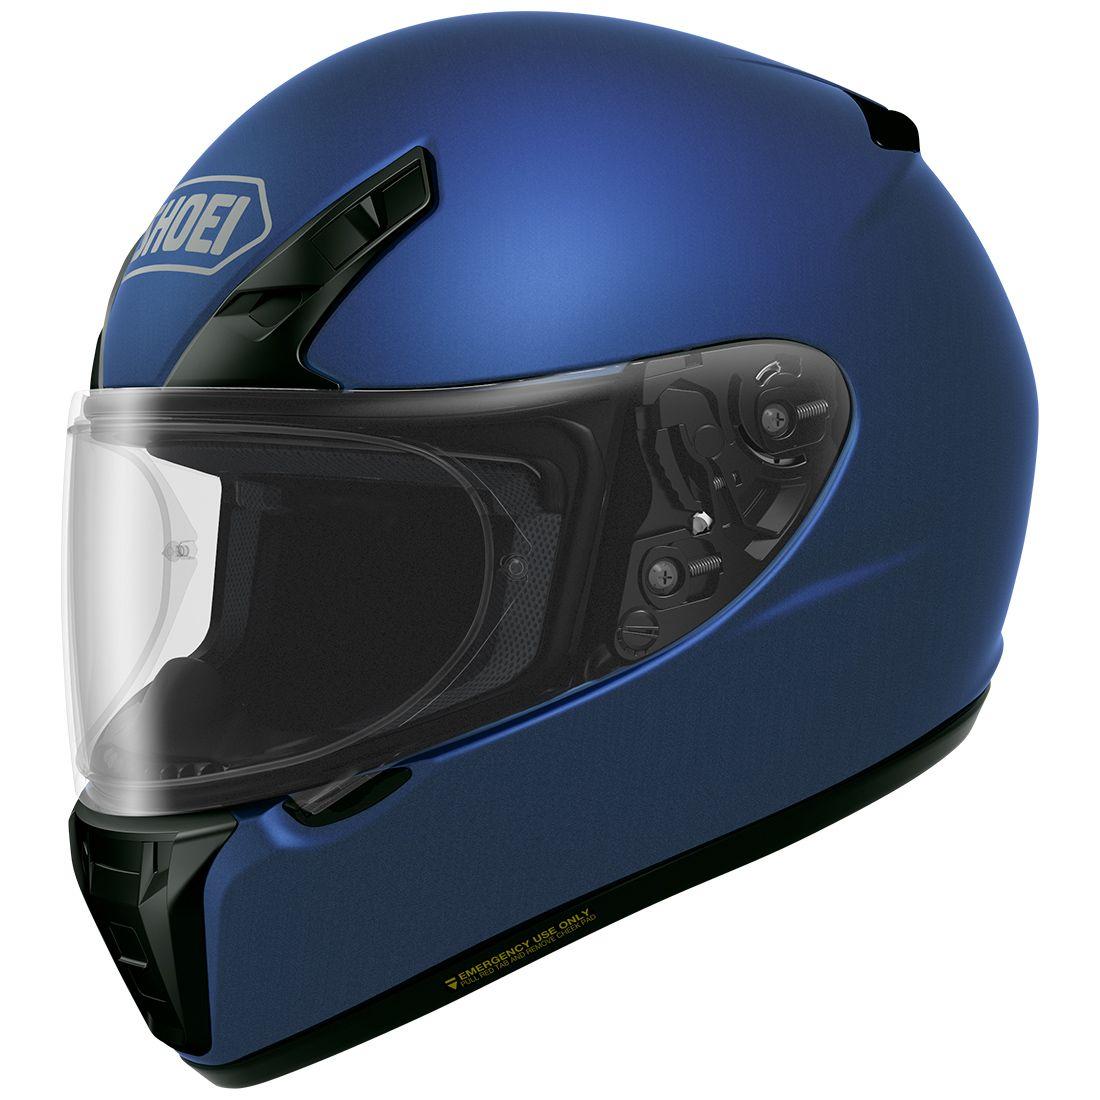 shoei launches new 2017 rf sr helmet and new graphics autoevolution. Black Bedroom Furniture Sets. Home Design Ideas